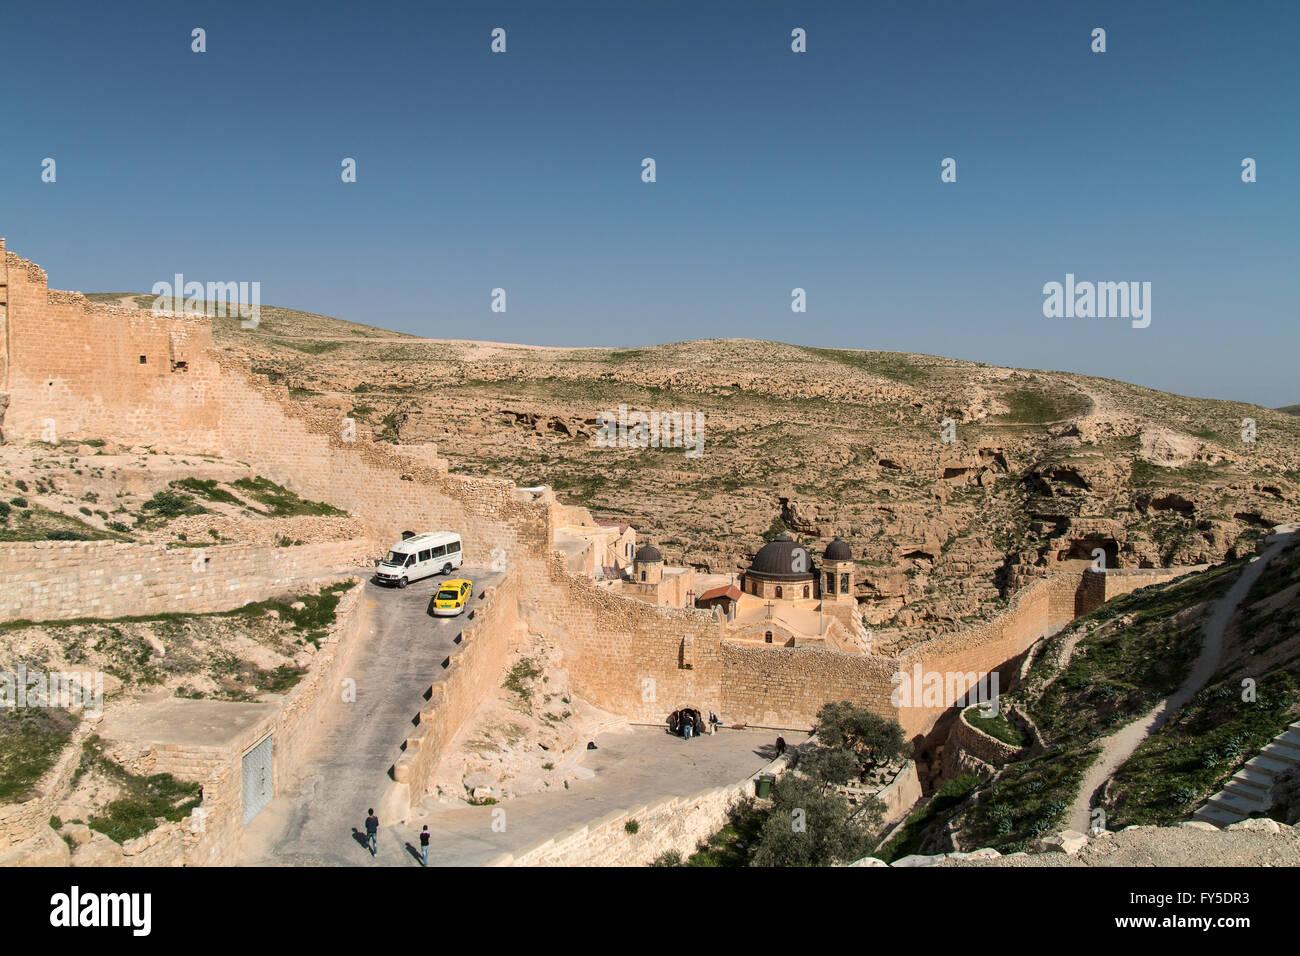 Mar Saba Greek Orthodox monastery Kidron Valley Palestine - Stock Image